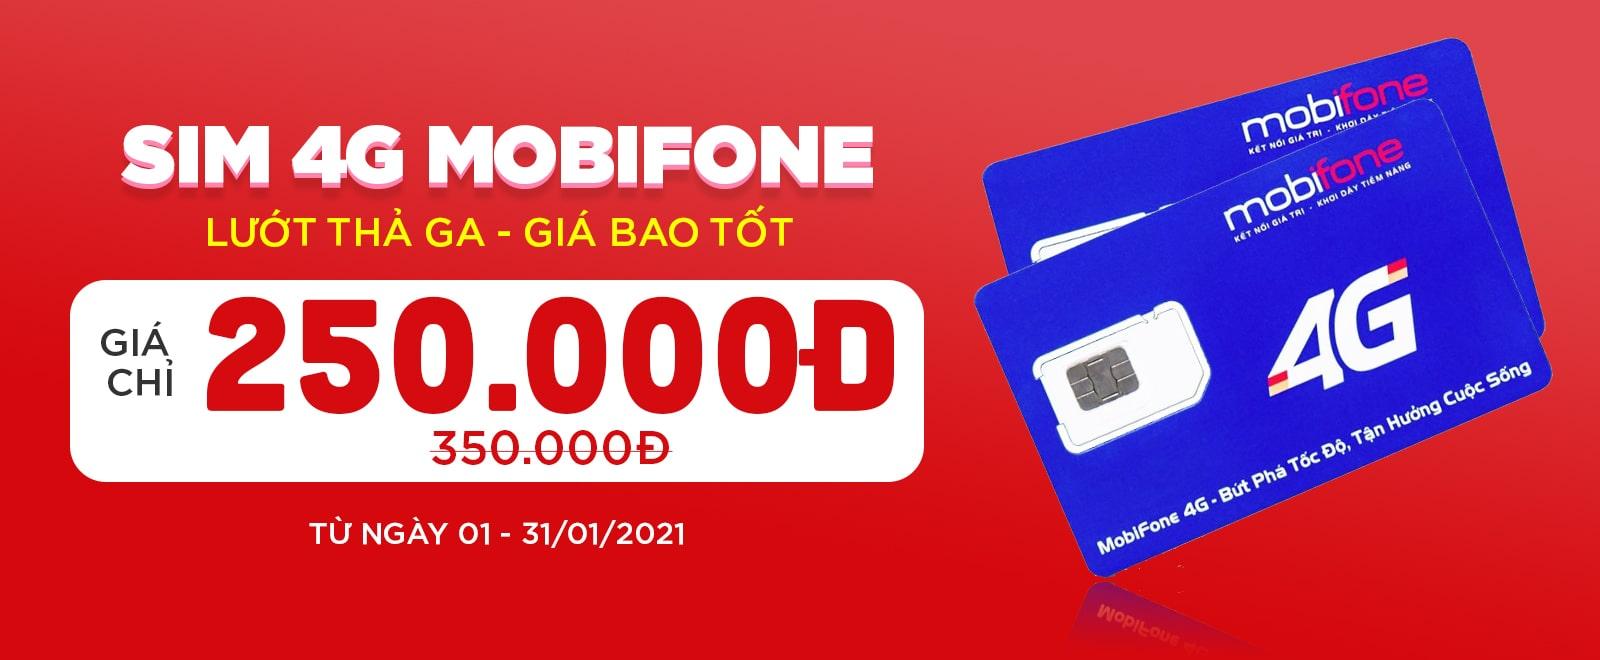 Sim 4G Mobifone Giá ưu đãi